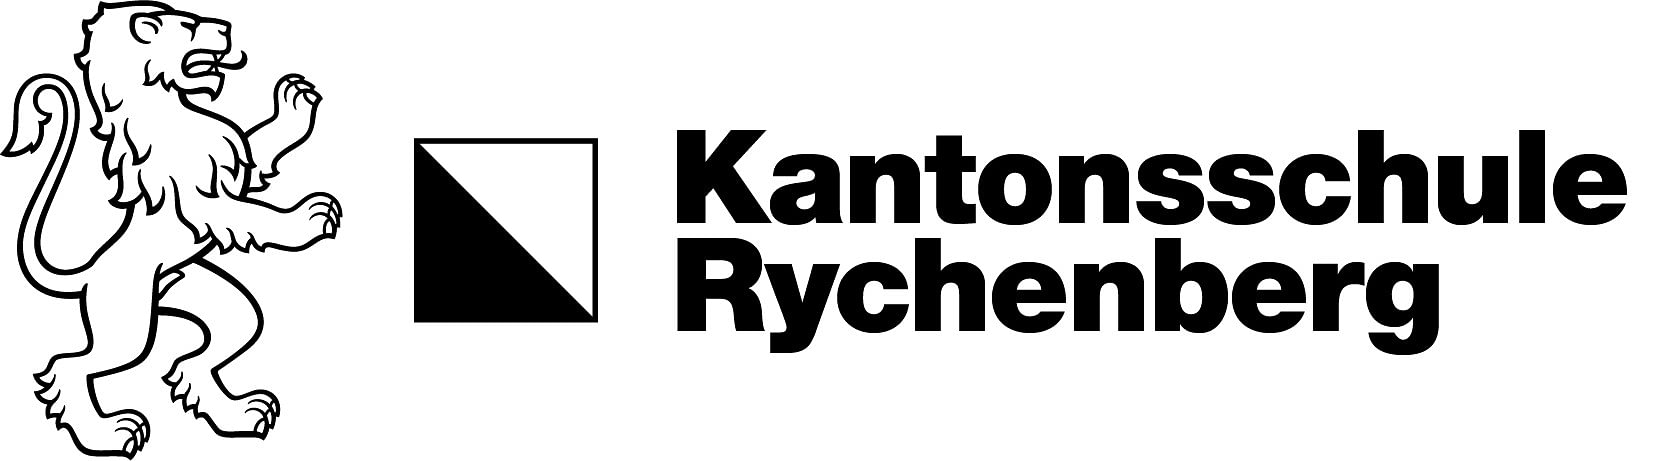 Kantonsschule Rychenberg